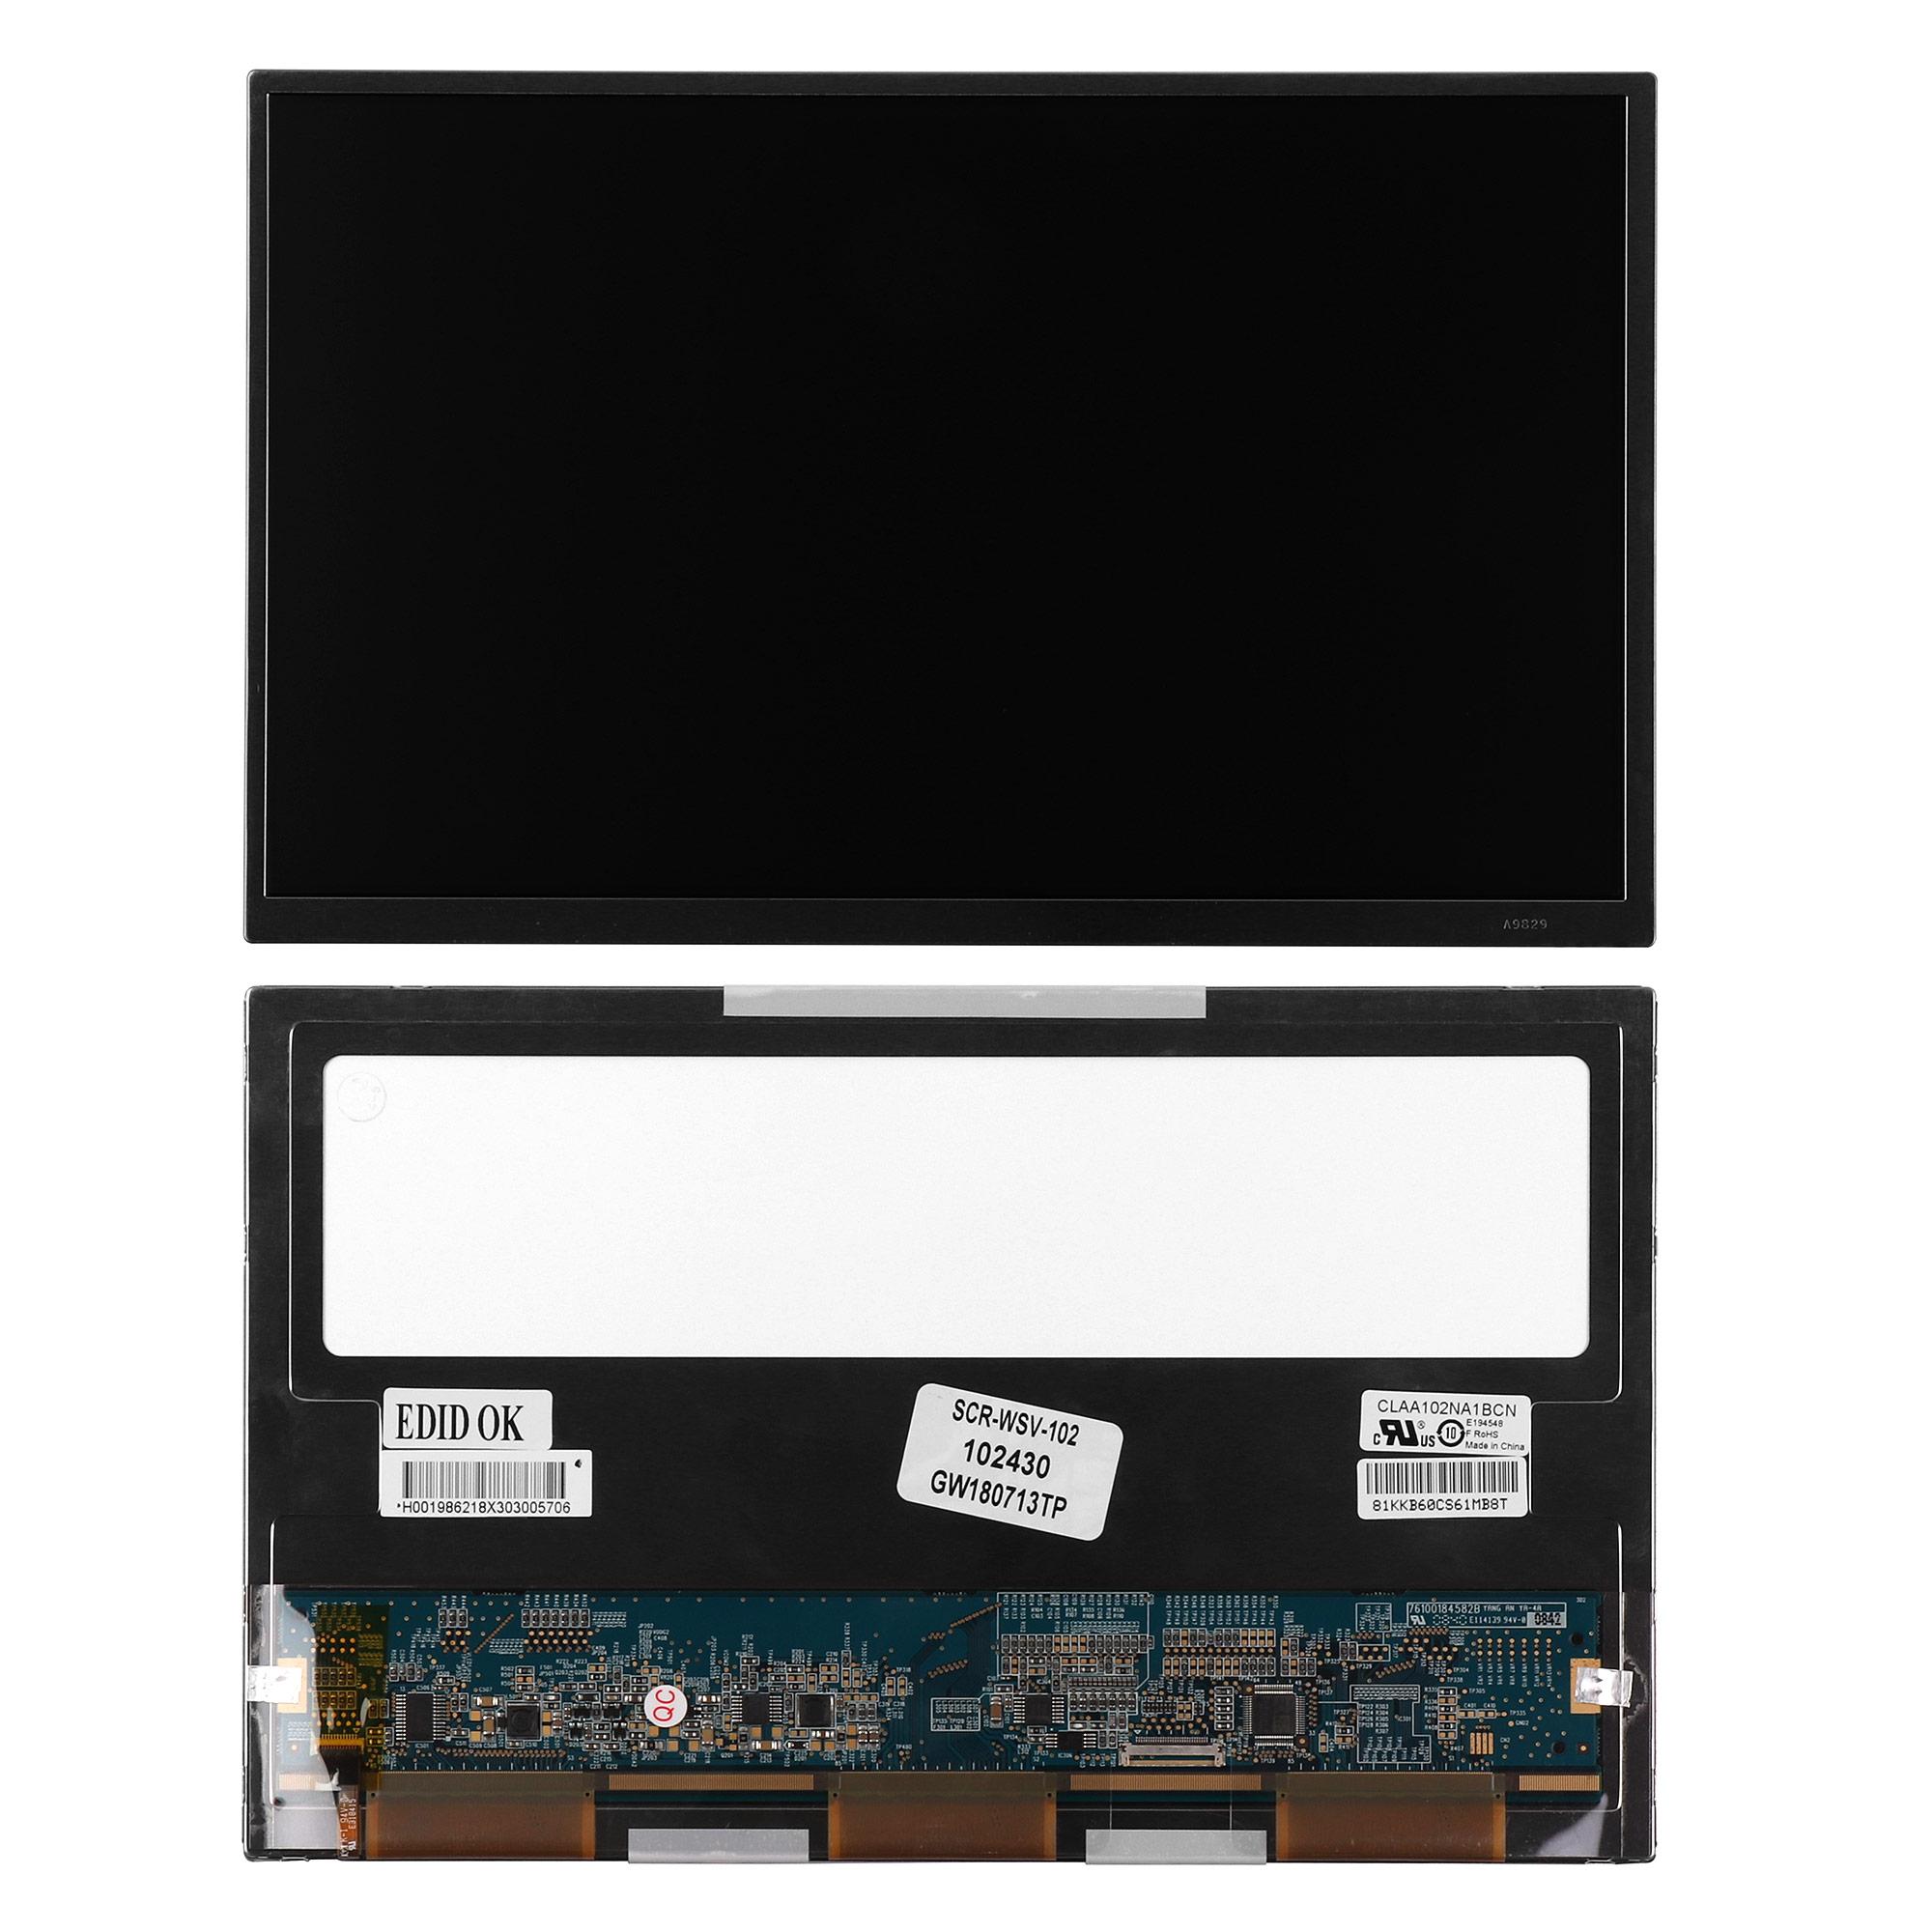 Запчасти для ремонта теле, видео, аудио 10.2 1024х600 WSVGA 30 pin LED. Матовая. PN: CLAA102NA1BCN